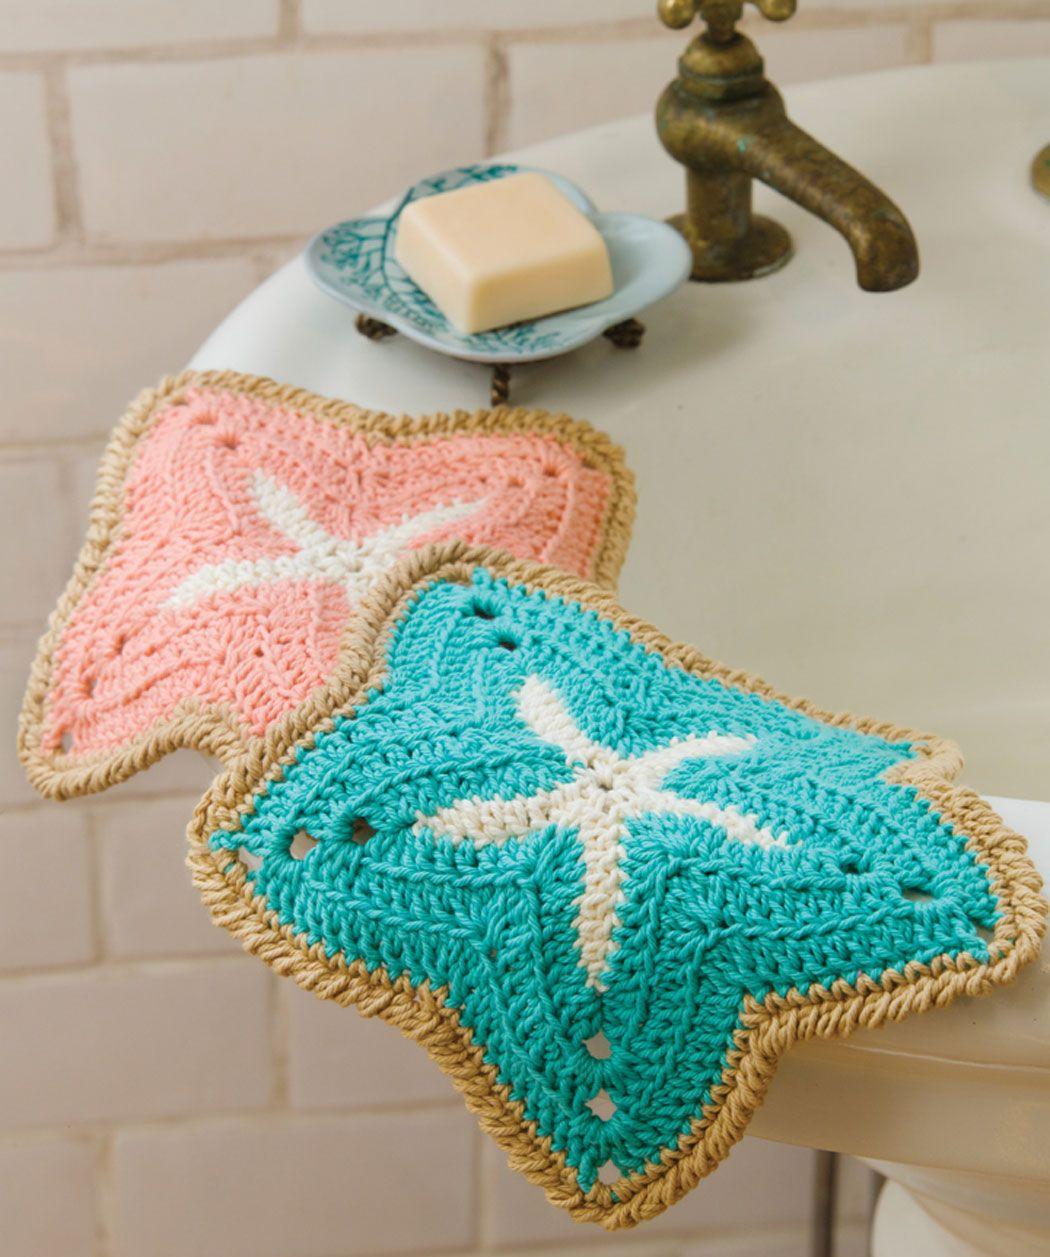 Starfish Dishcloths Free Pattern #crochet | crochet | Pinterest ...